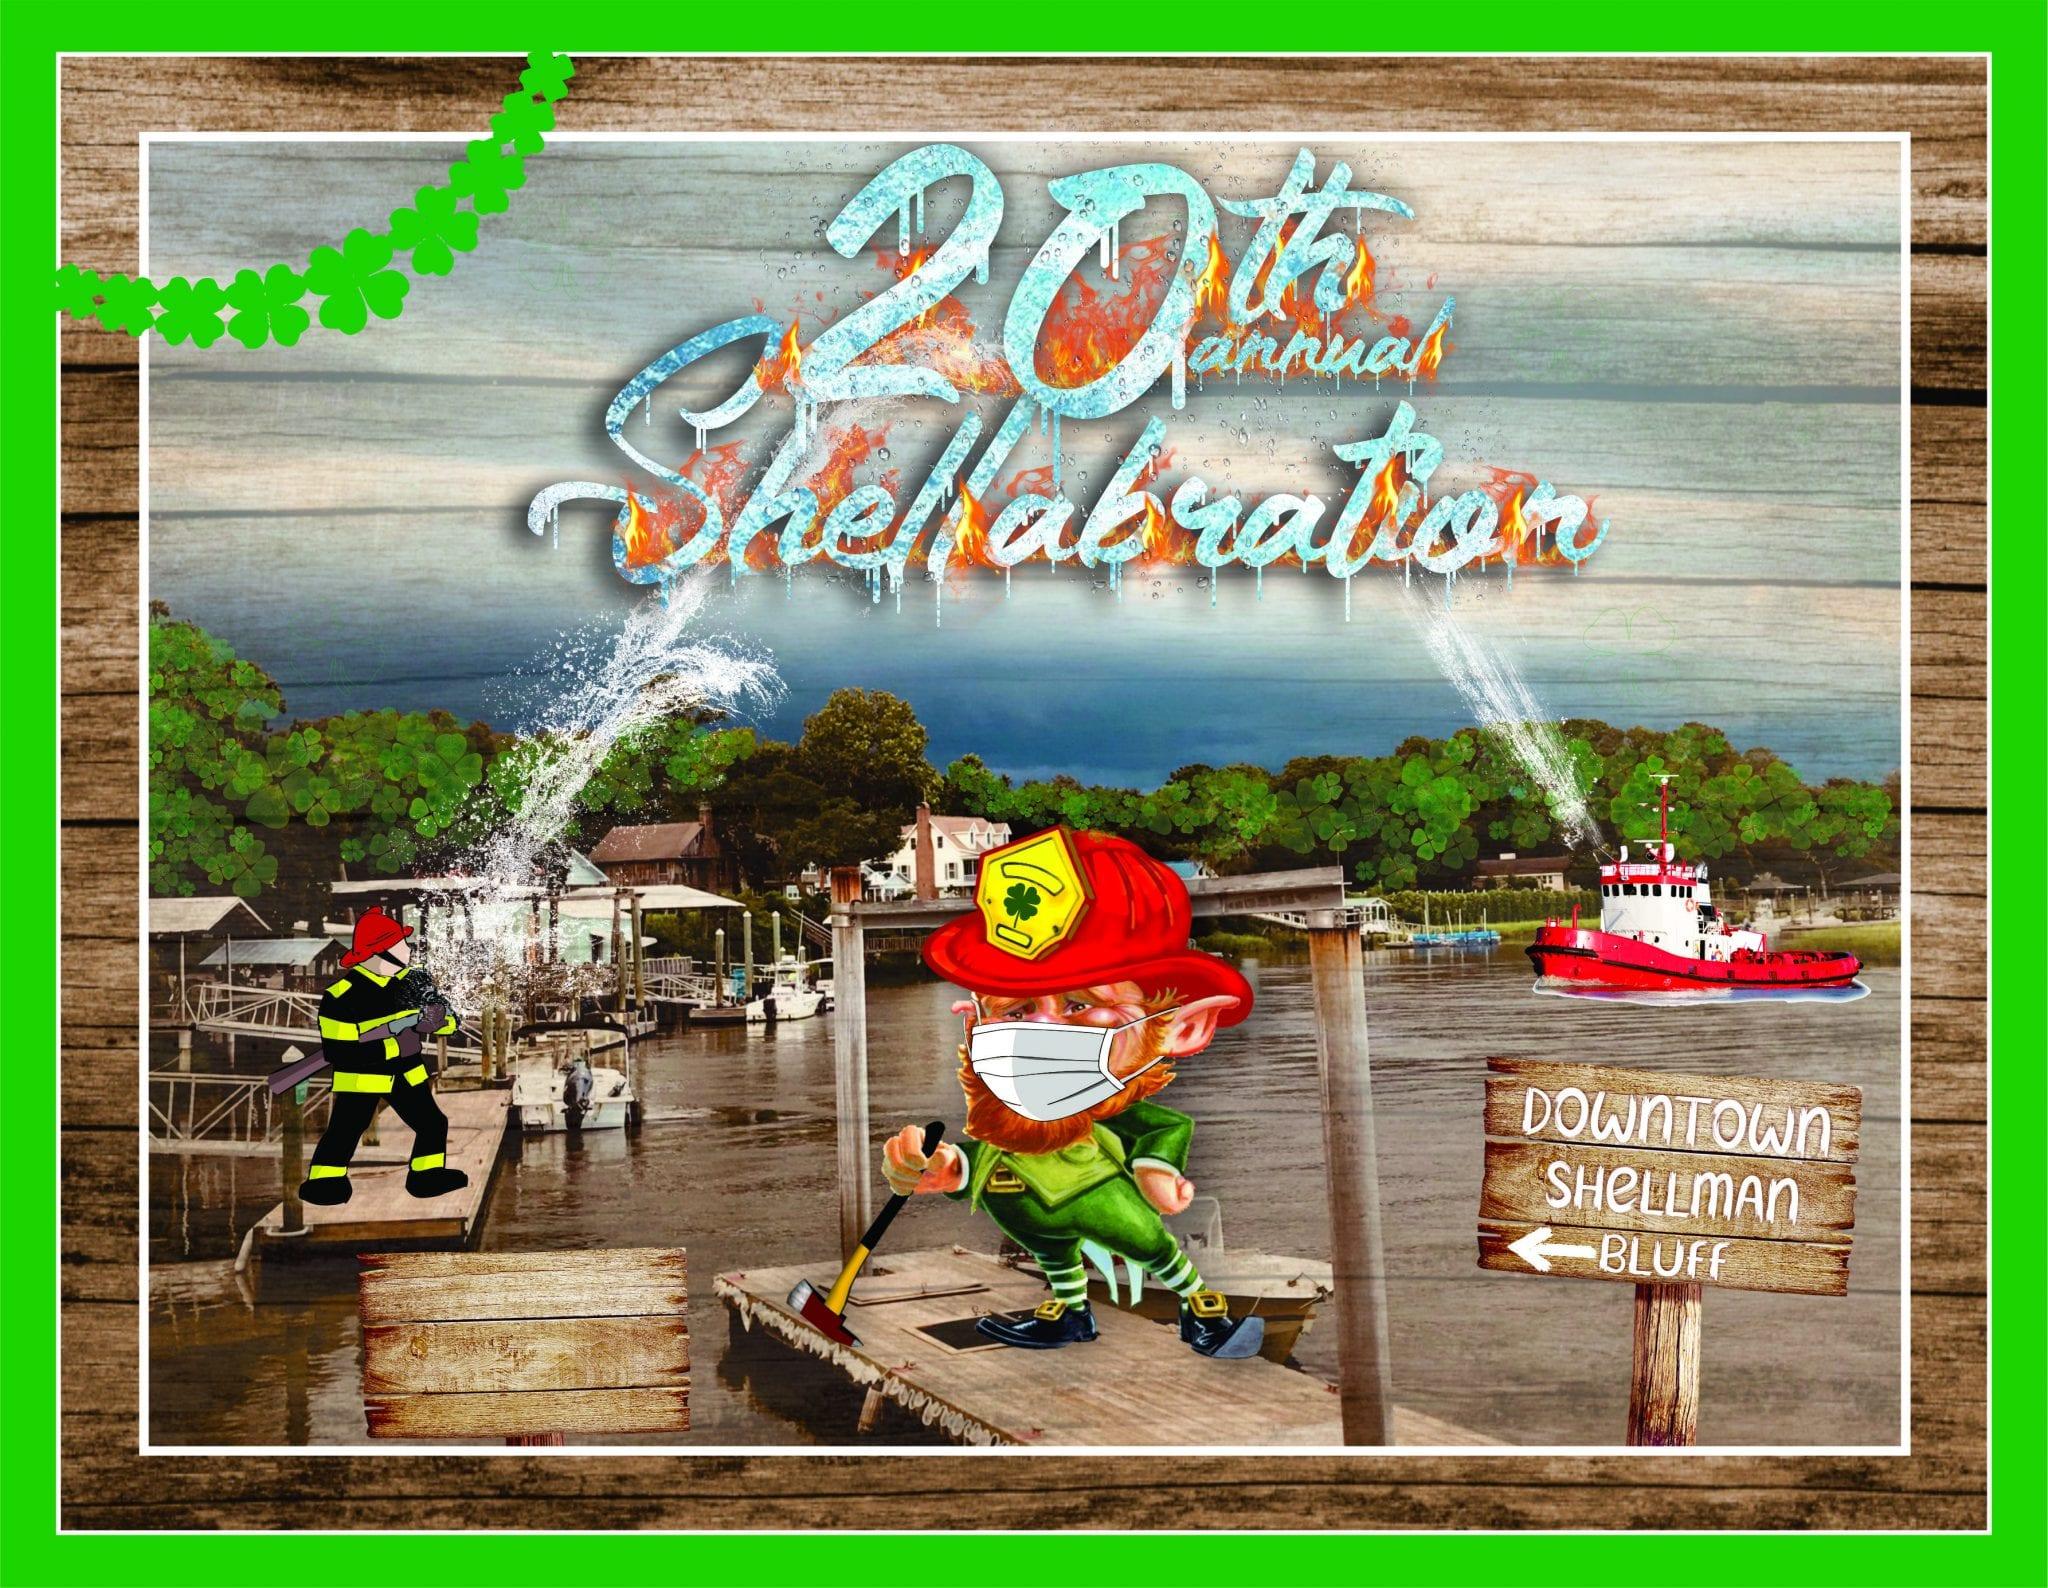 FOSB 2021 Shellabration Back